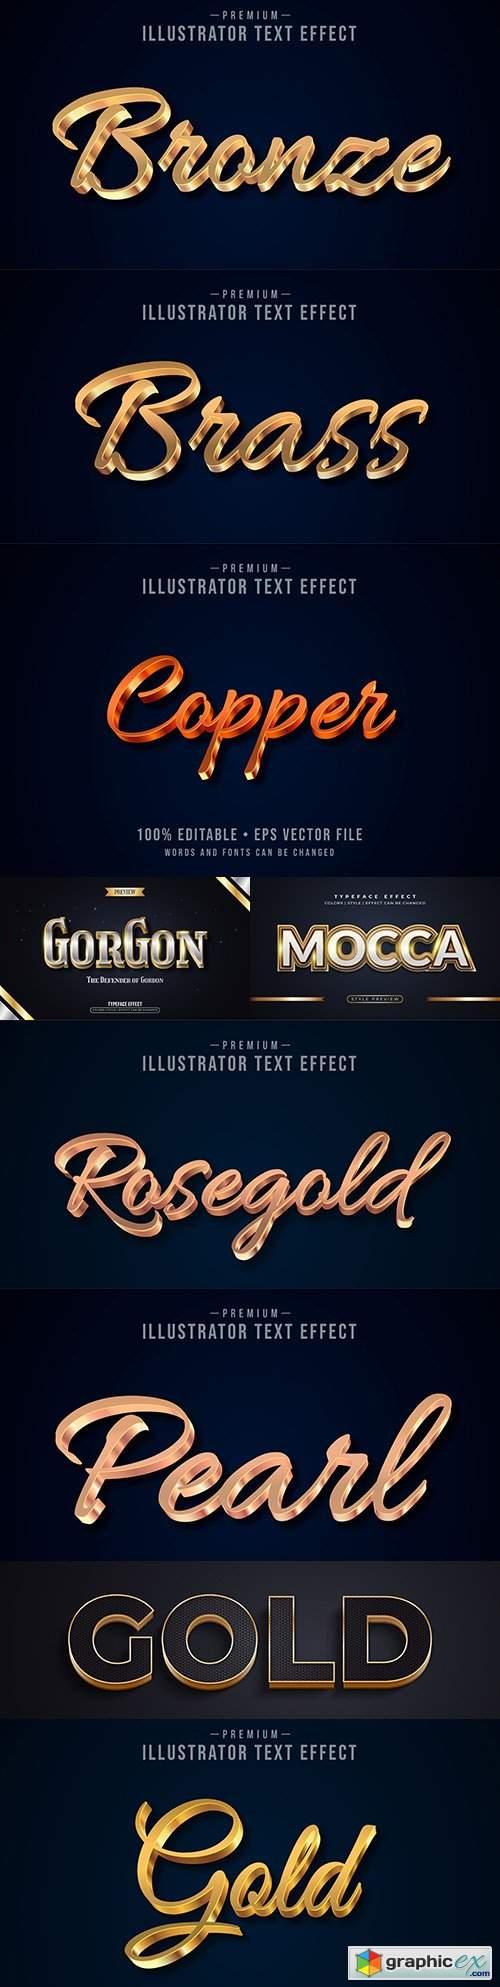 Editable font effect text collection illustration design 70